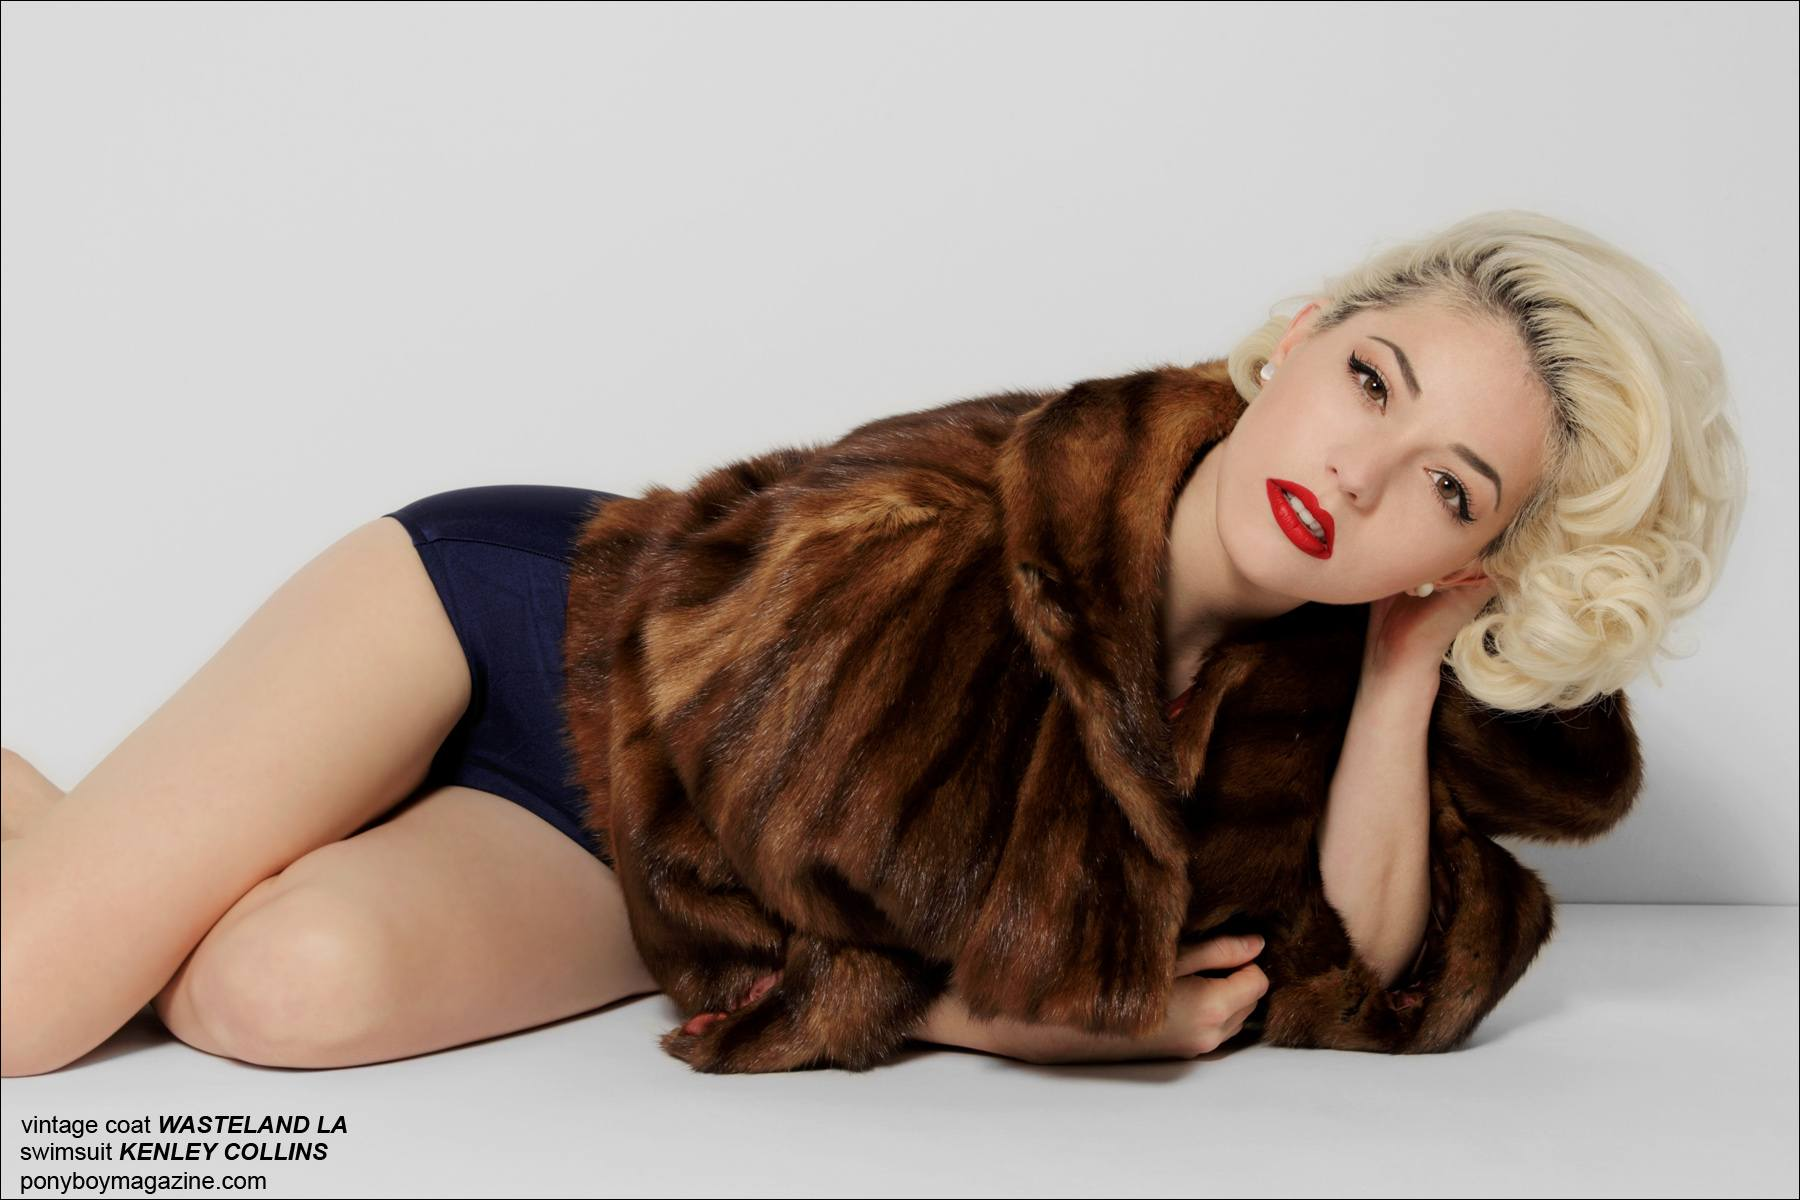 Designer Kenley Collins modelis a vintage fur cape for Ponyboy Magazine, photographed by Alexander Thompson.